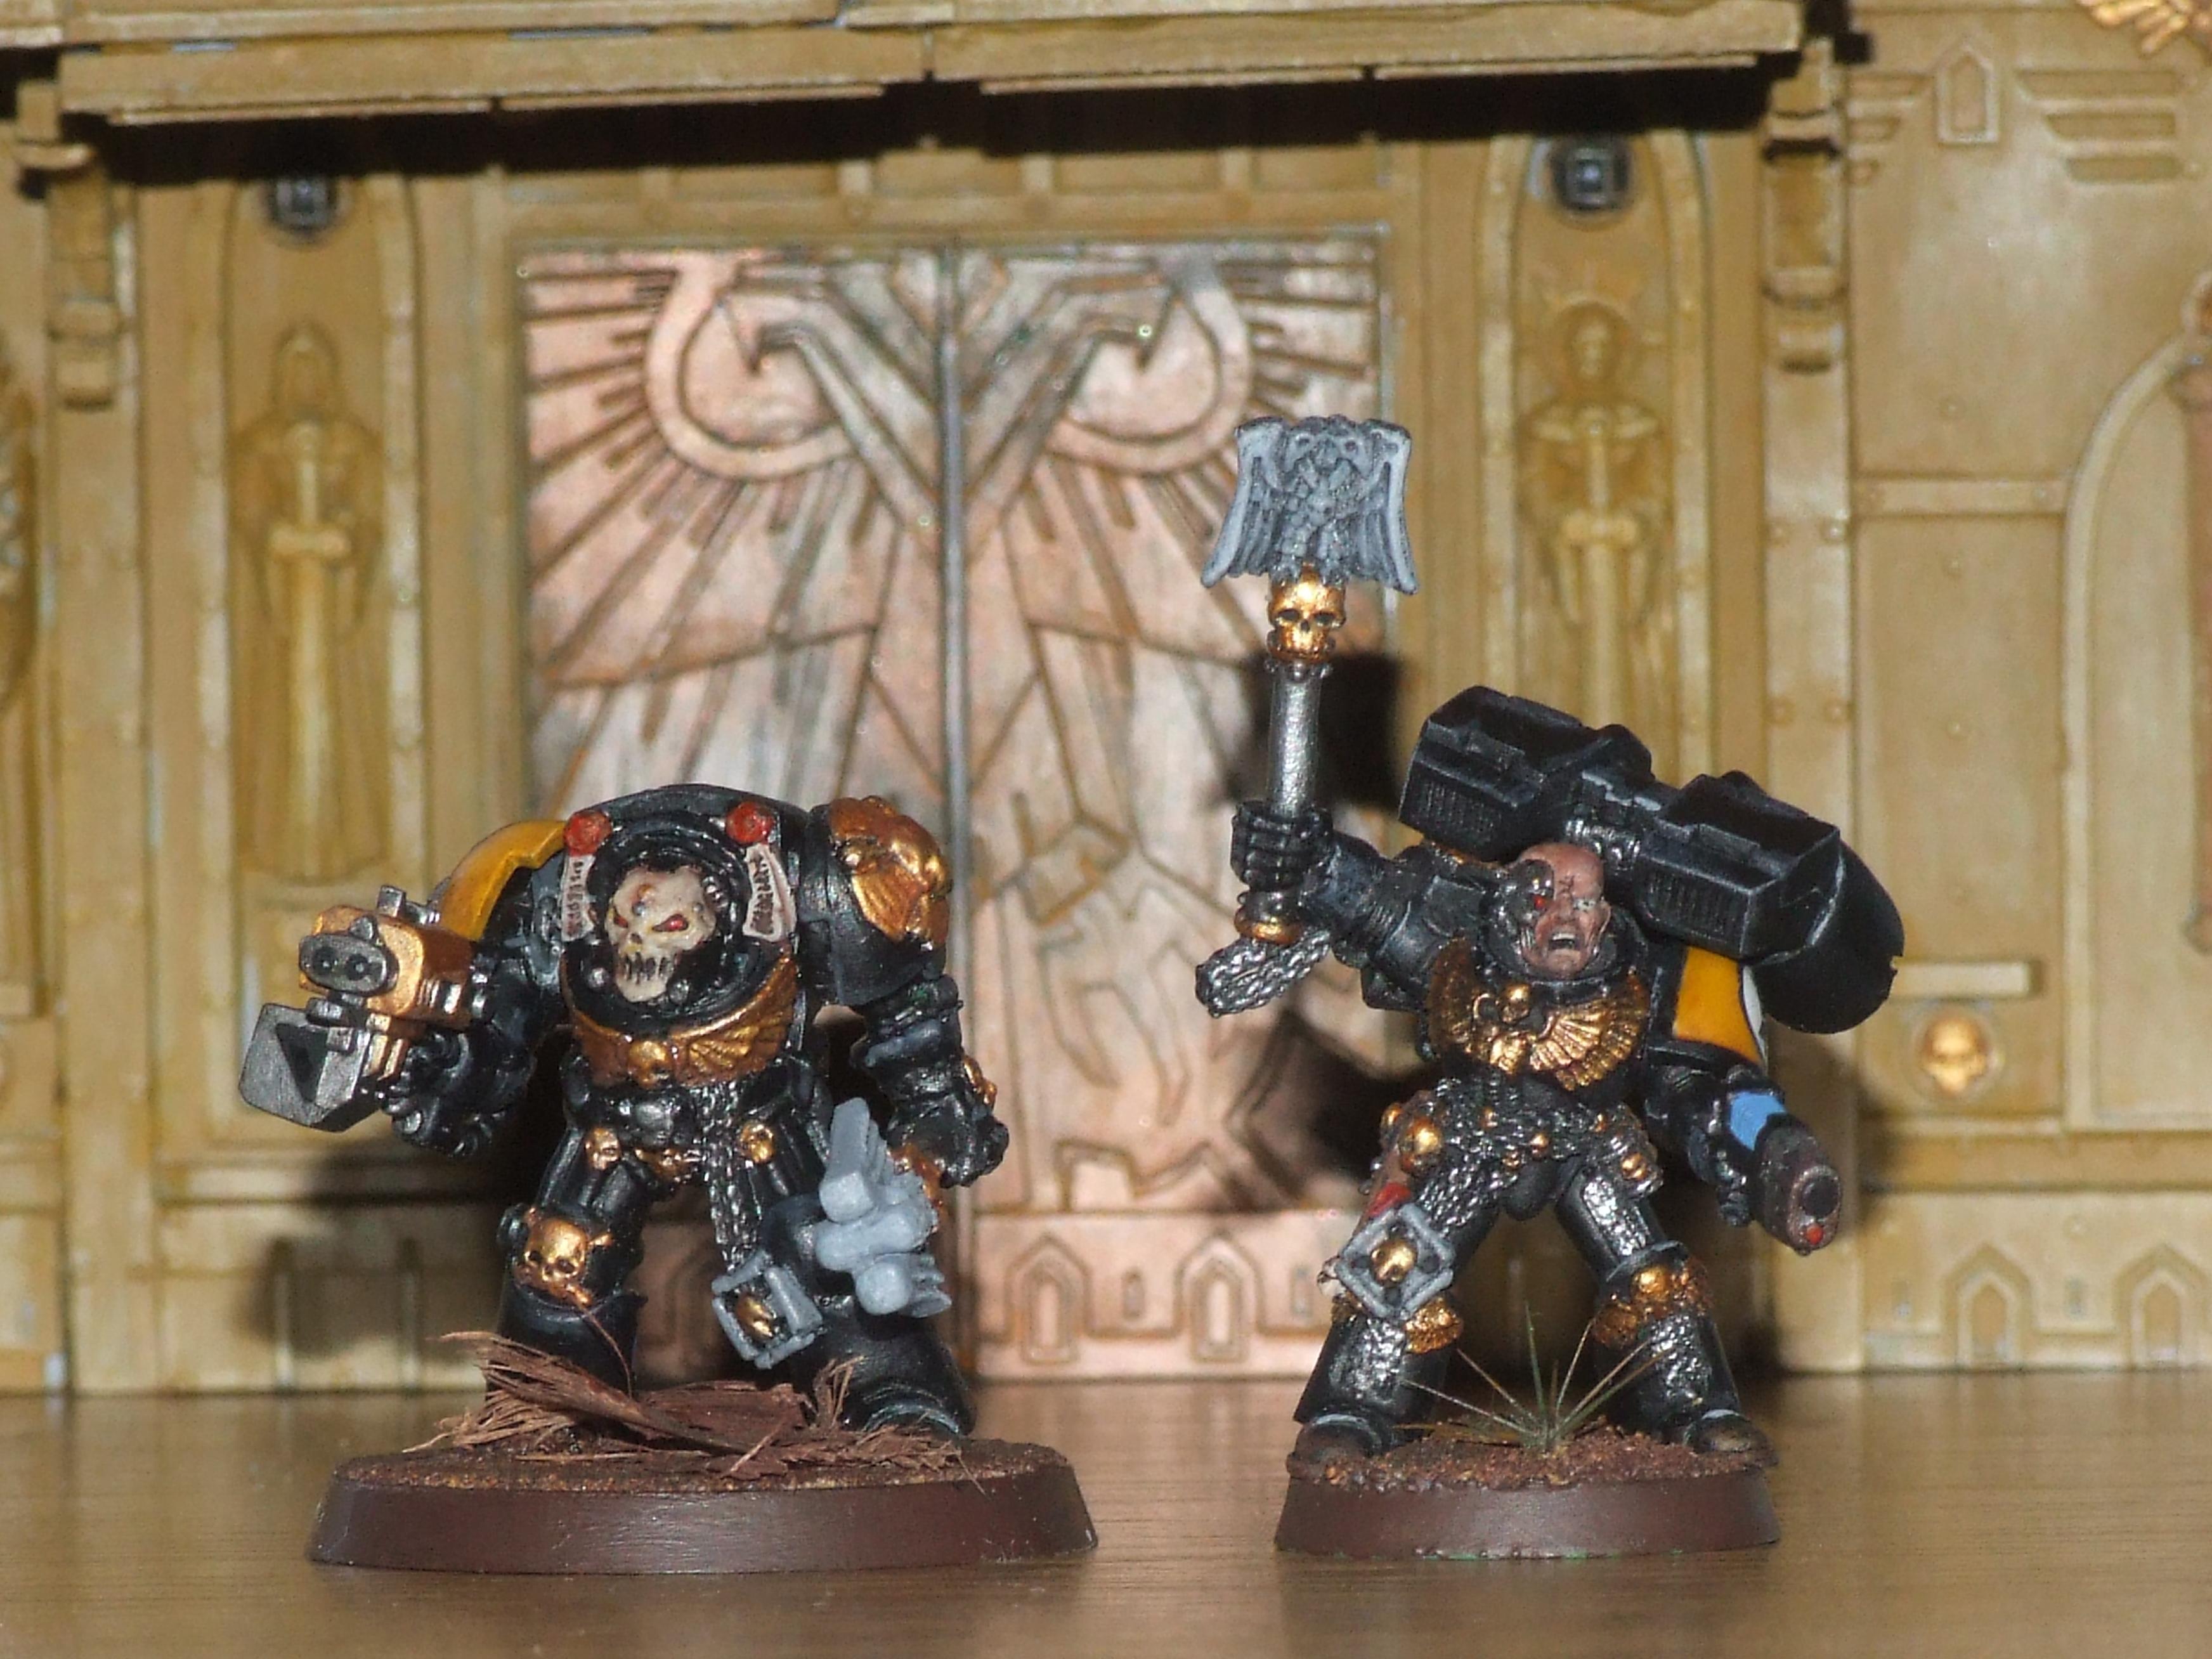 Chaplain, Imperial Fists, Jump Pack, Power Armour, Terminator Armor